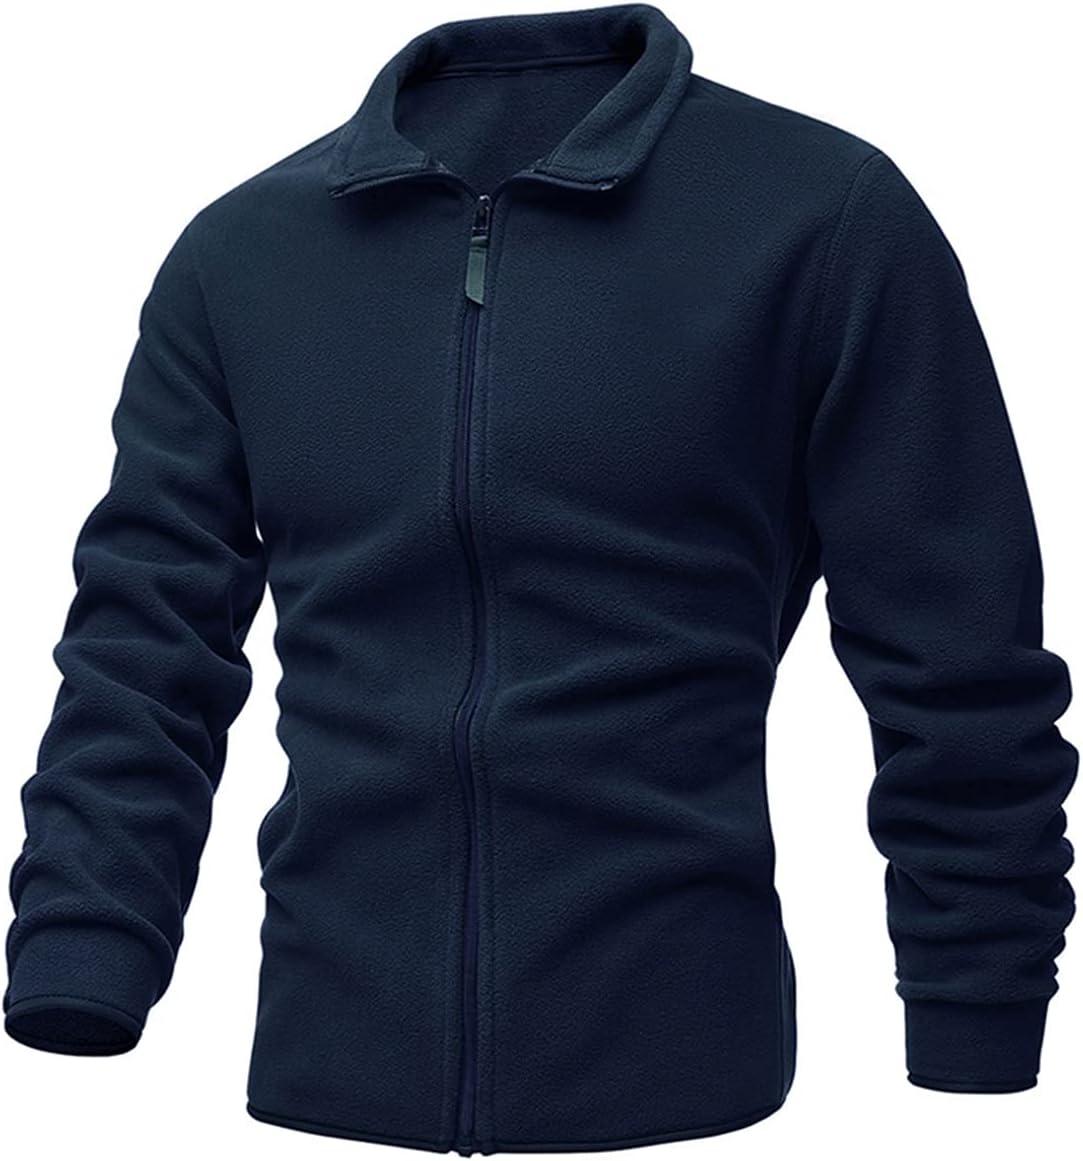 PJRYC Men's Jacket Slim Double-Faced Fleece Sweater Casual Warm Winter Coat (Color : Blue, Size : A)